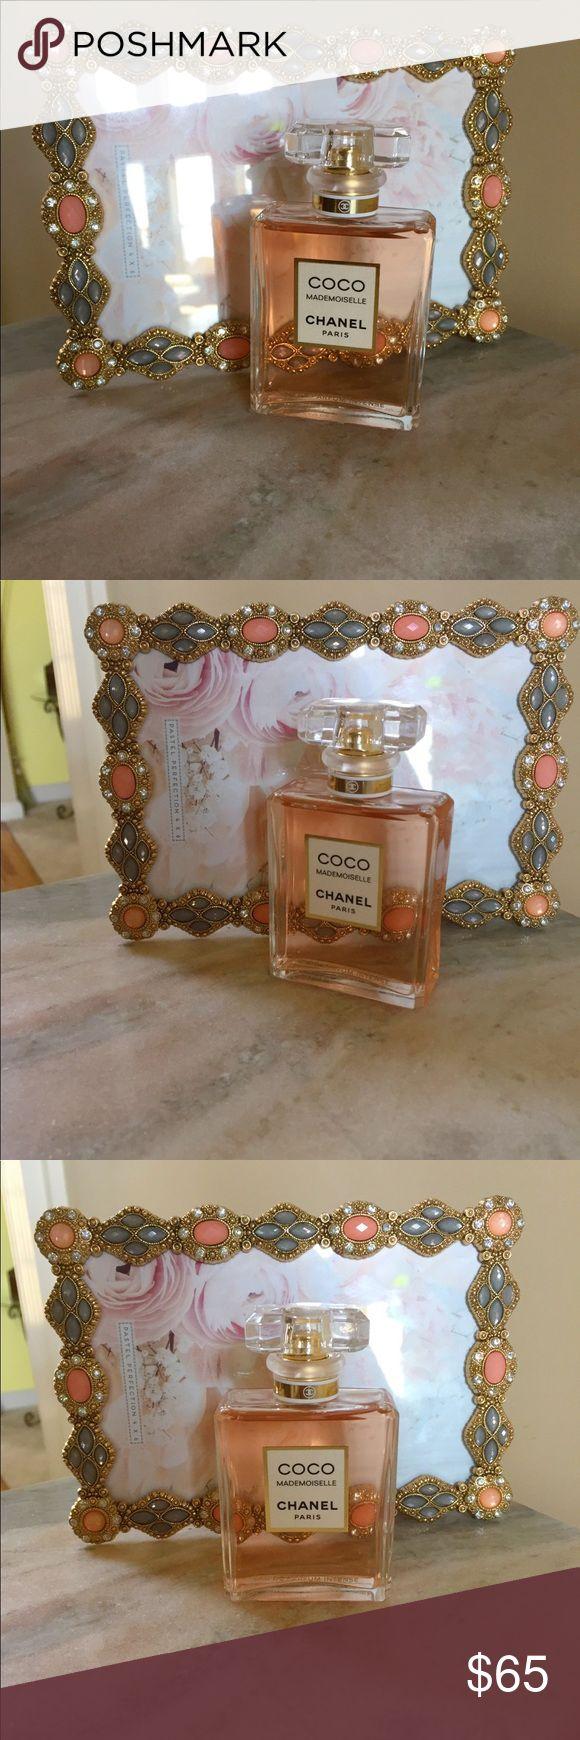 COCO MADEMOISELLE Eau De Parfum Intense Spray An intense